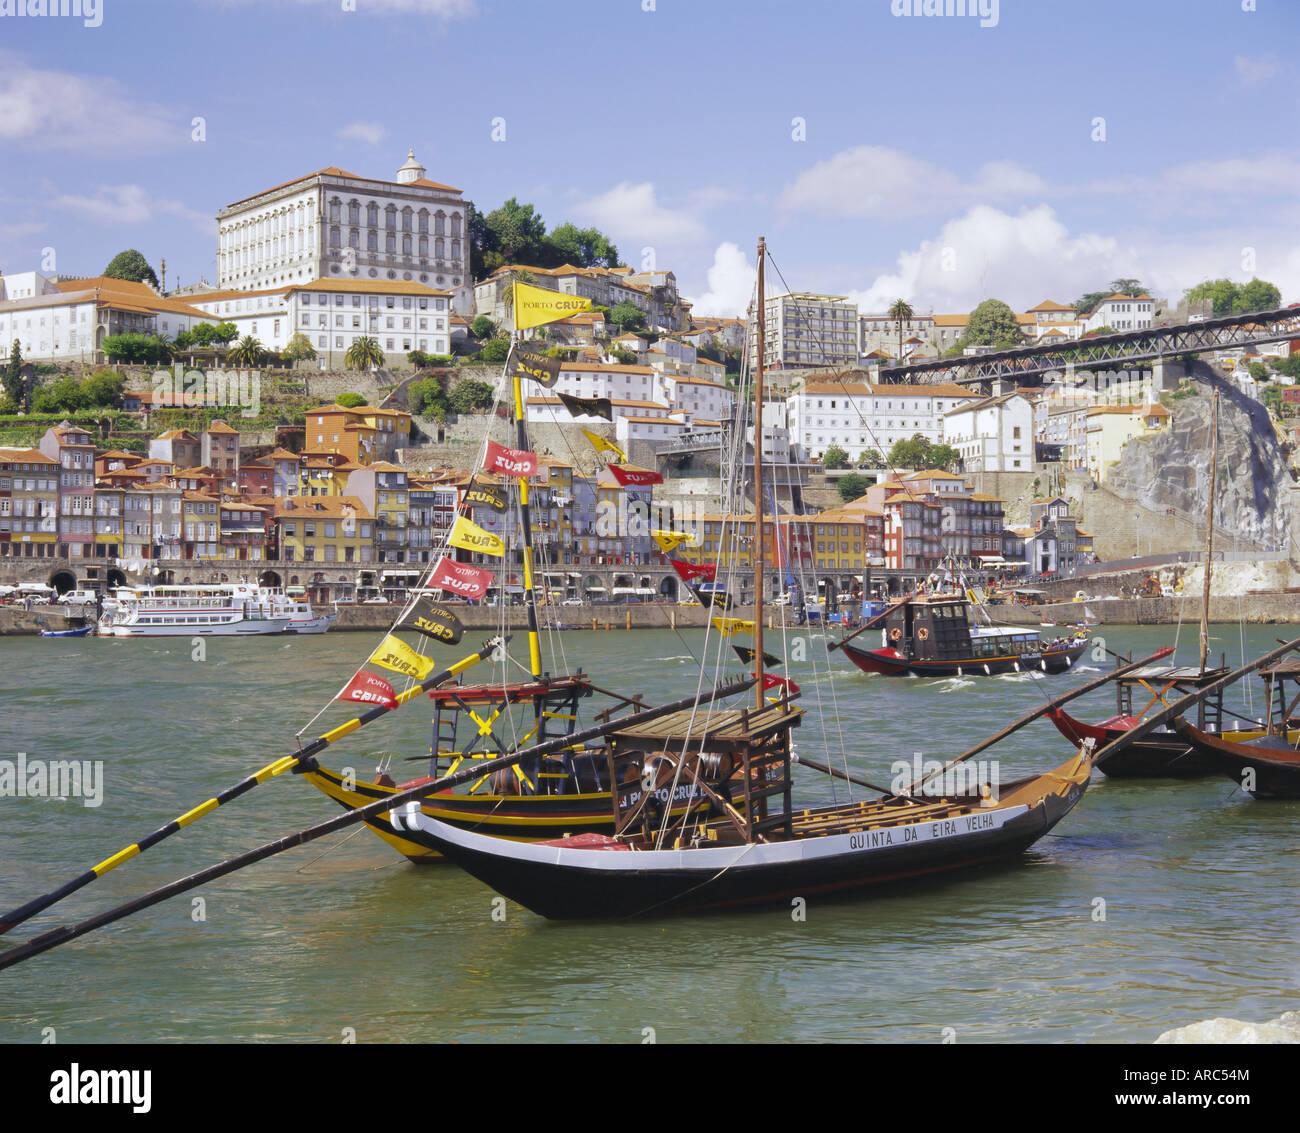 Douro River and Old Town, Porto (Oporto), Portugal, Europe - Stock Image